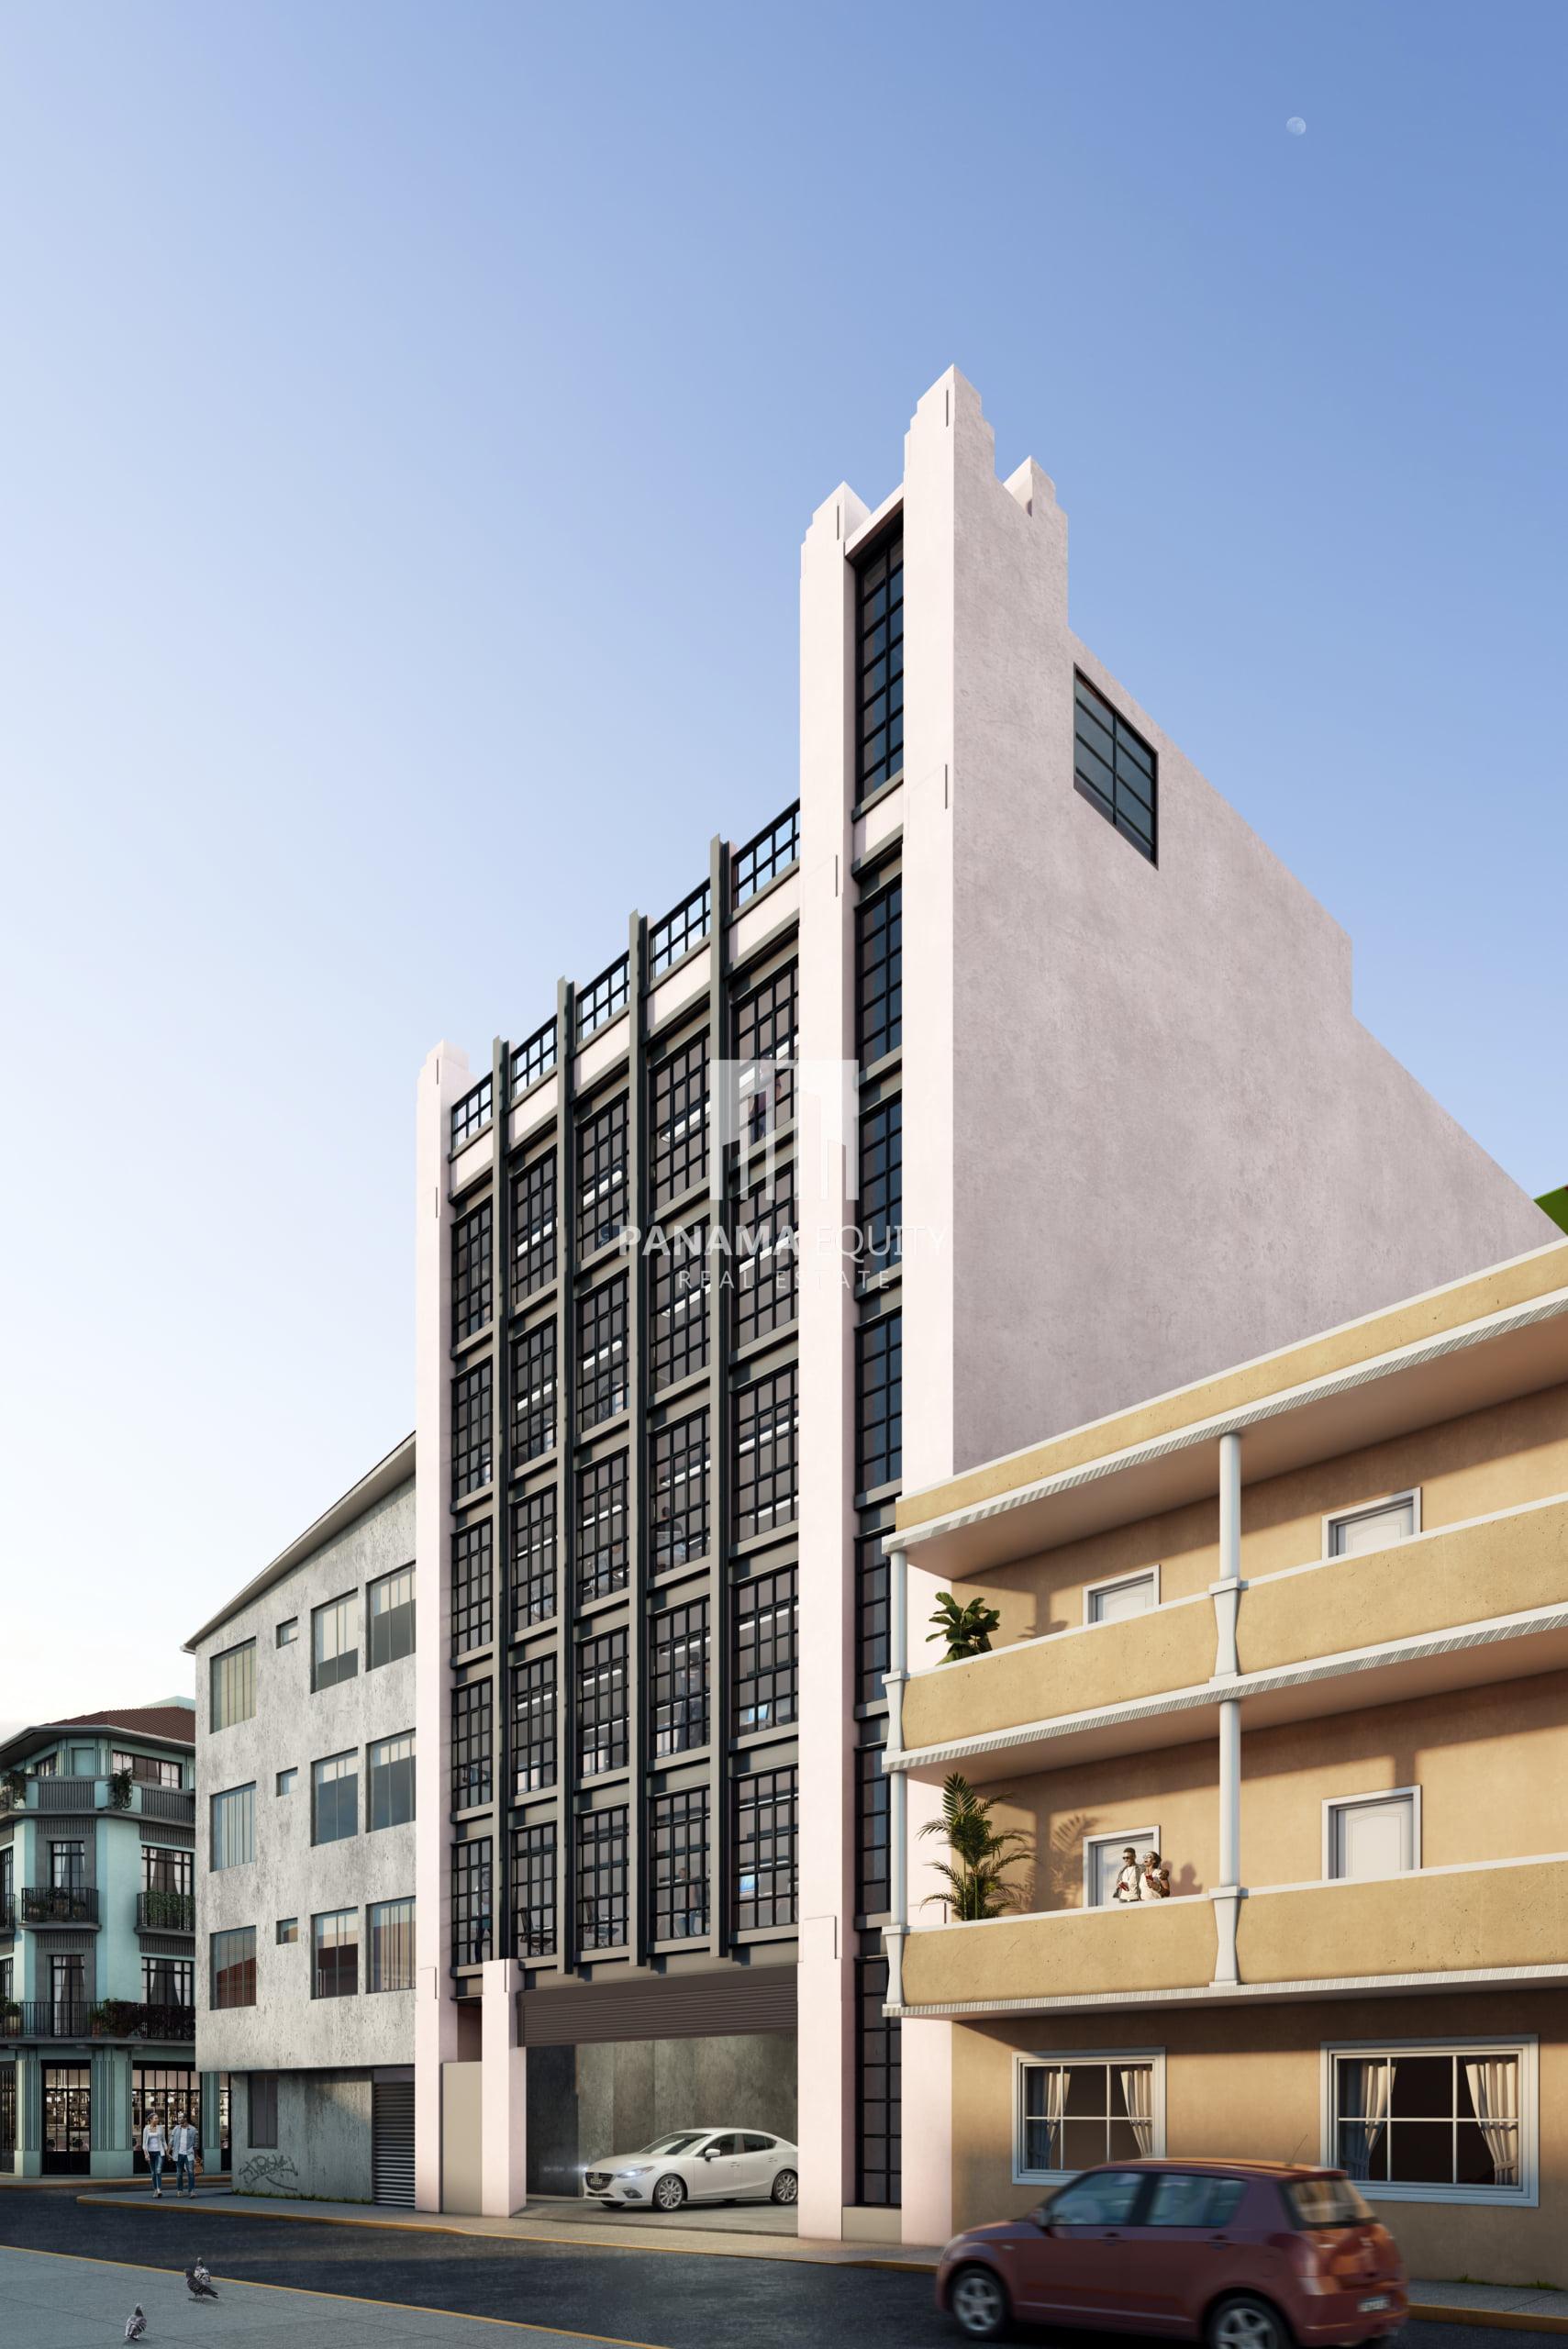 Development Land For Sale in Casco Viejo Panama